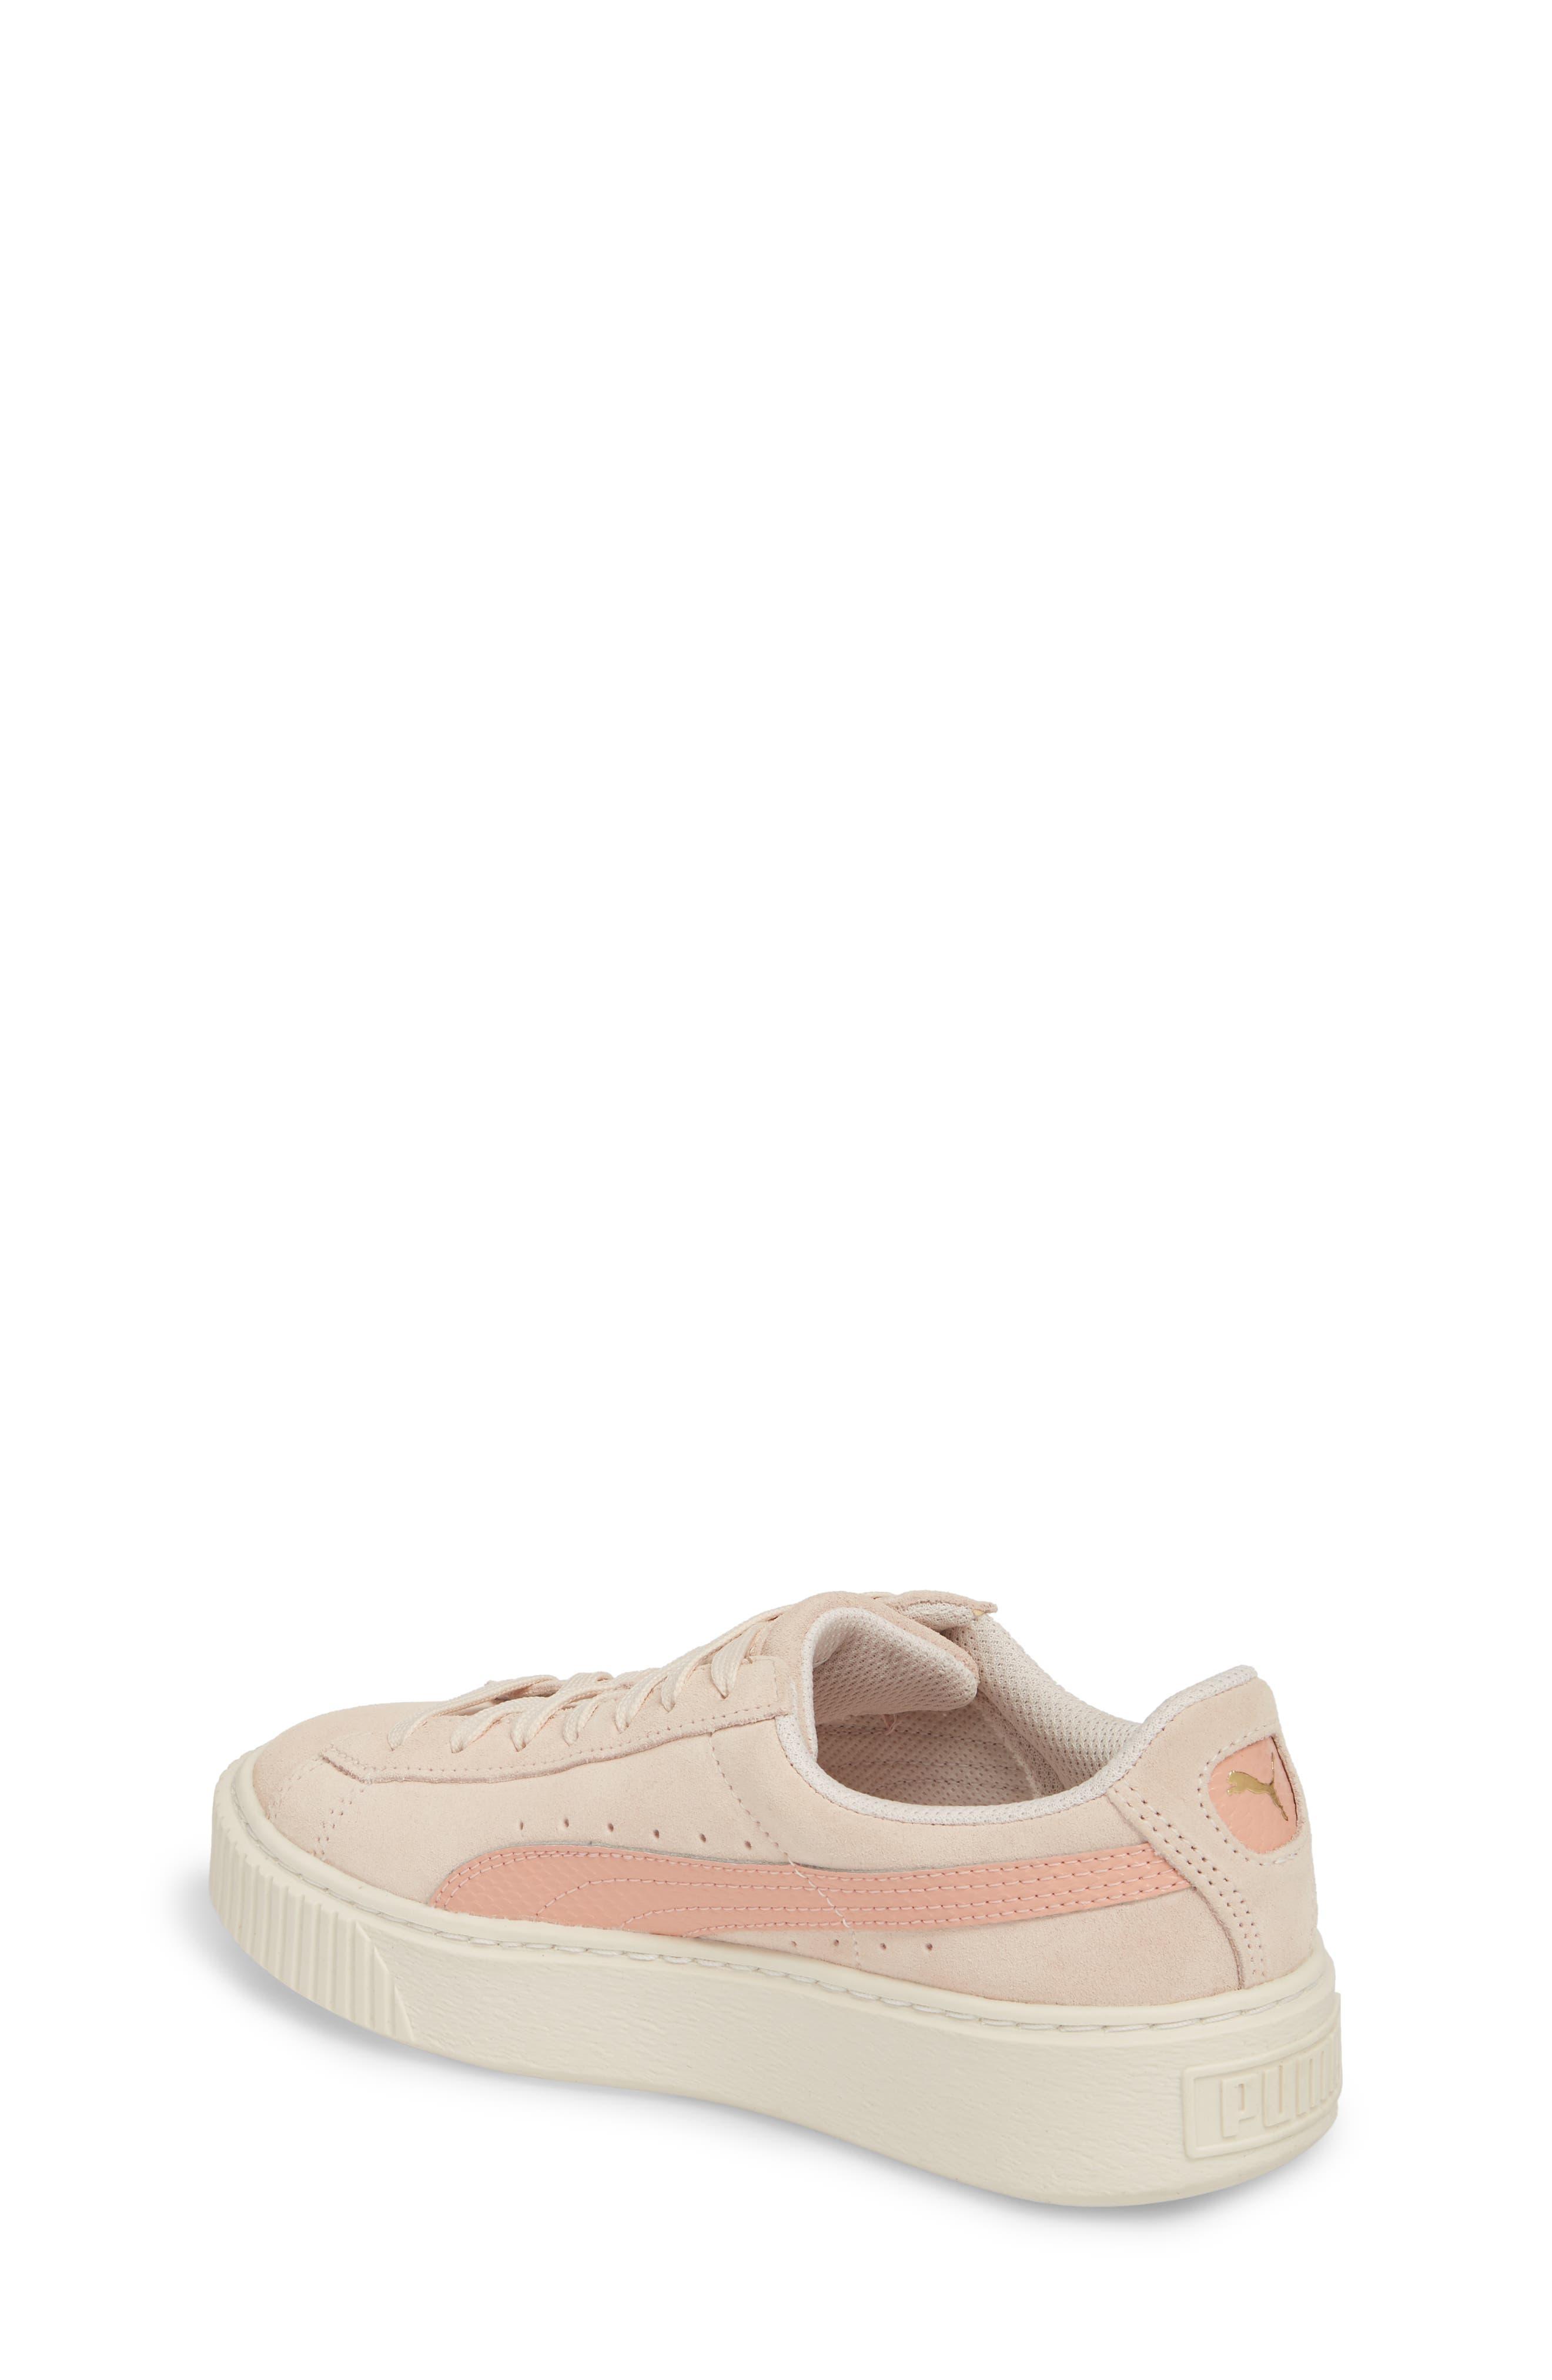 Suede Platform Jr Sneaker,                             Alternate thumbnail 2, color,                             Pearl/ Peach Beige